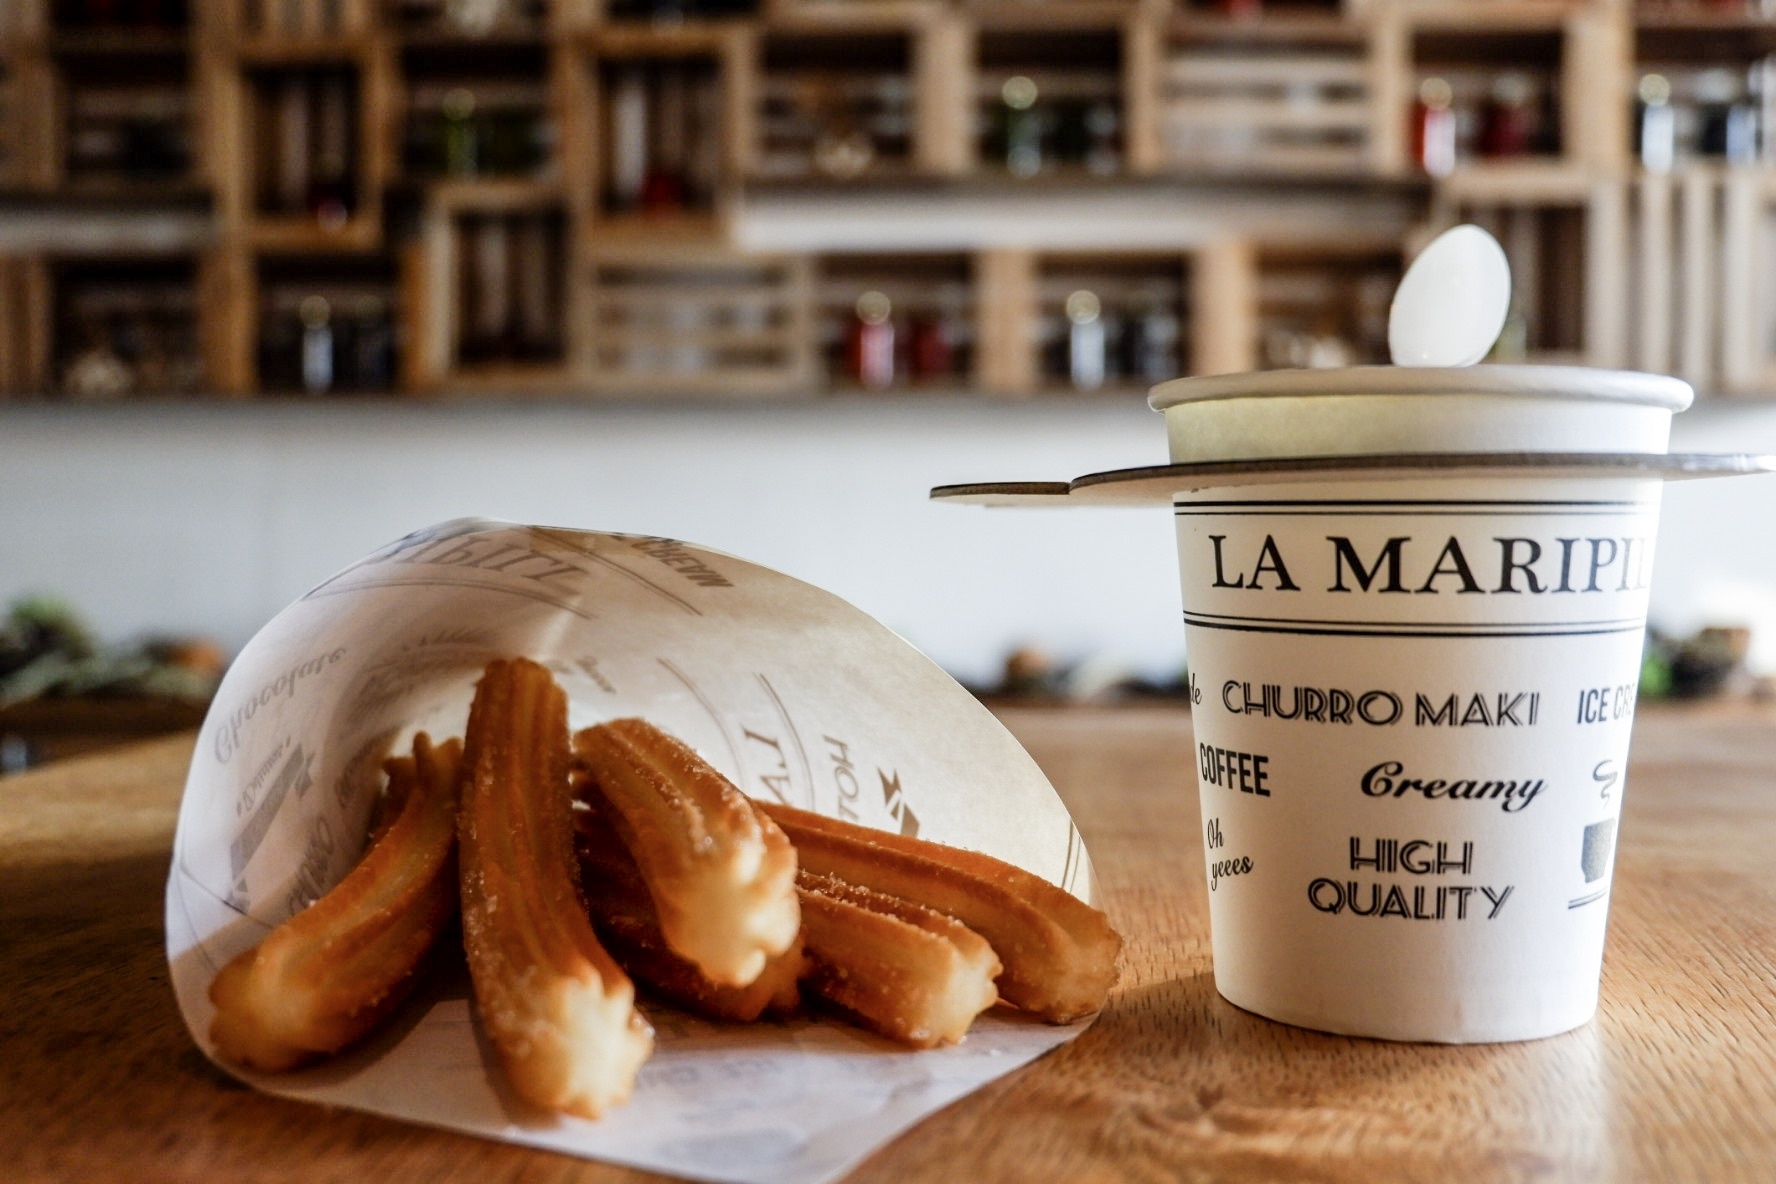 La-Maripili